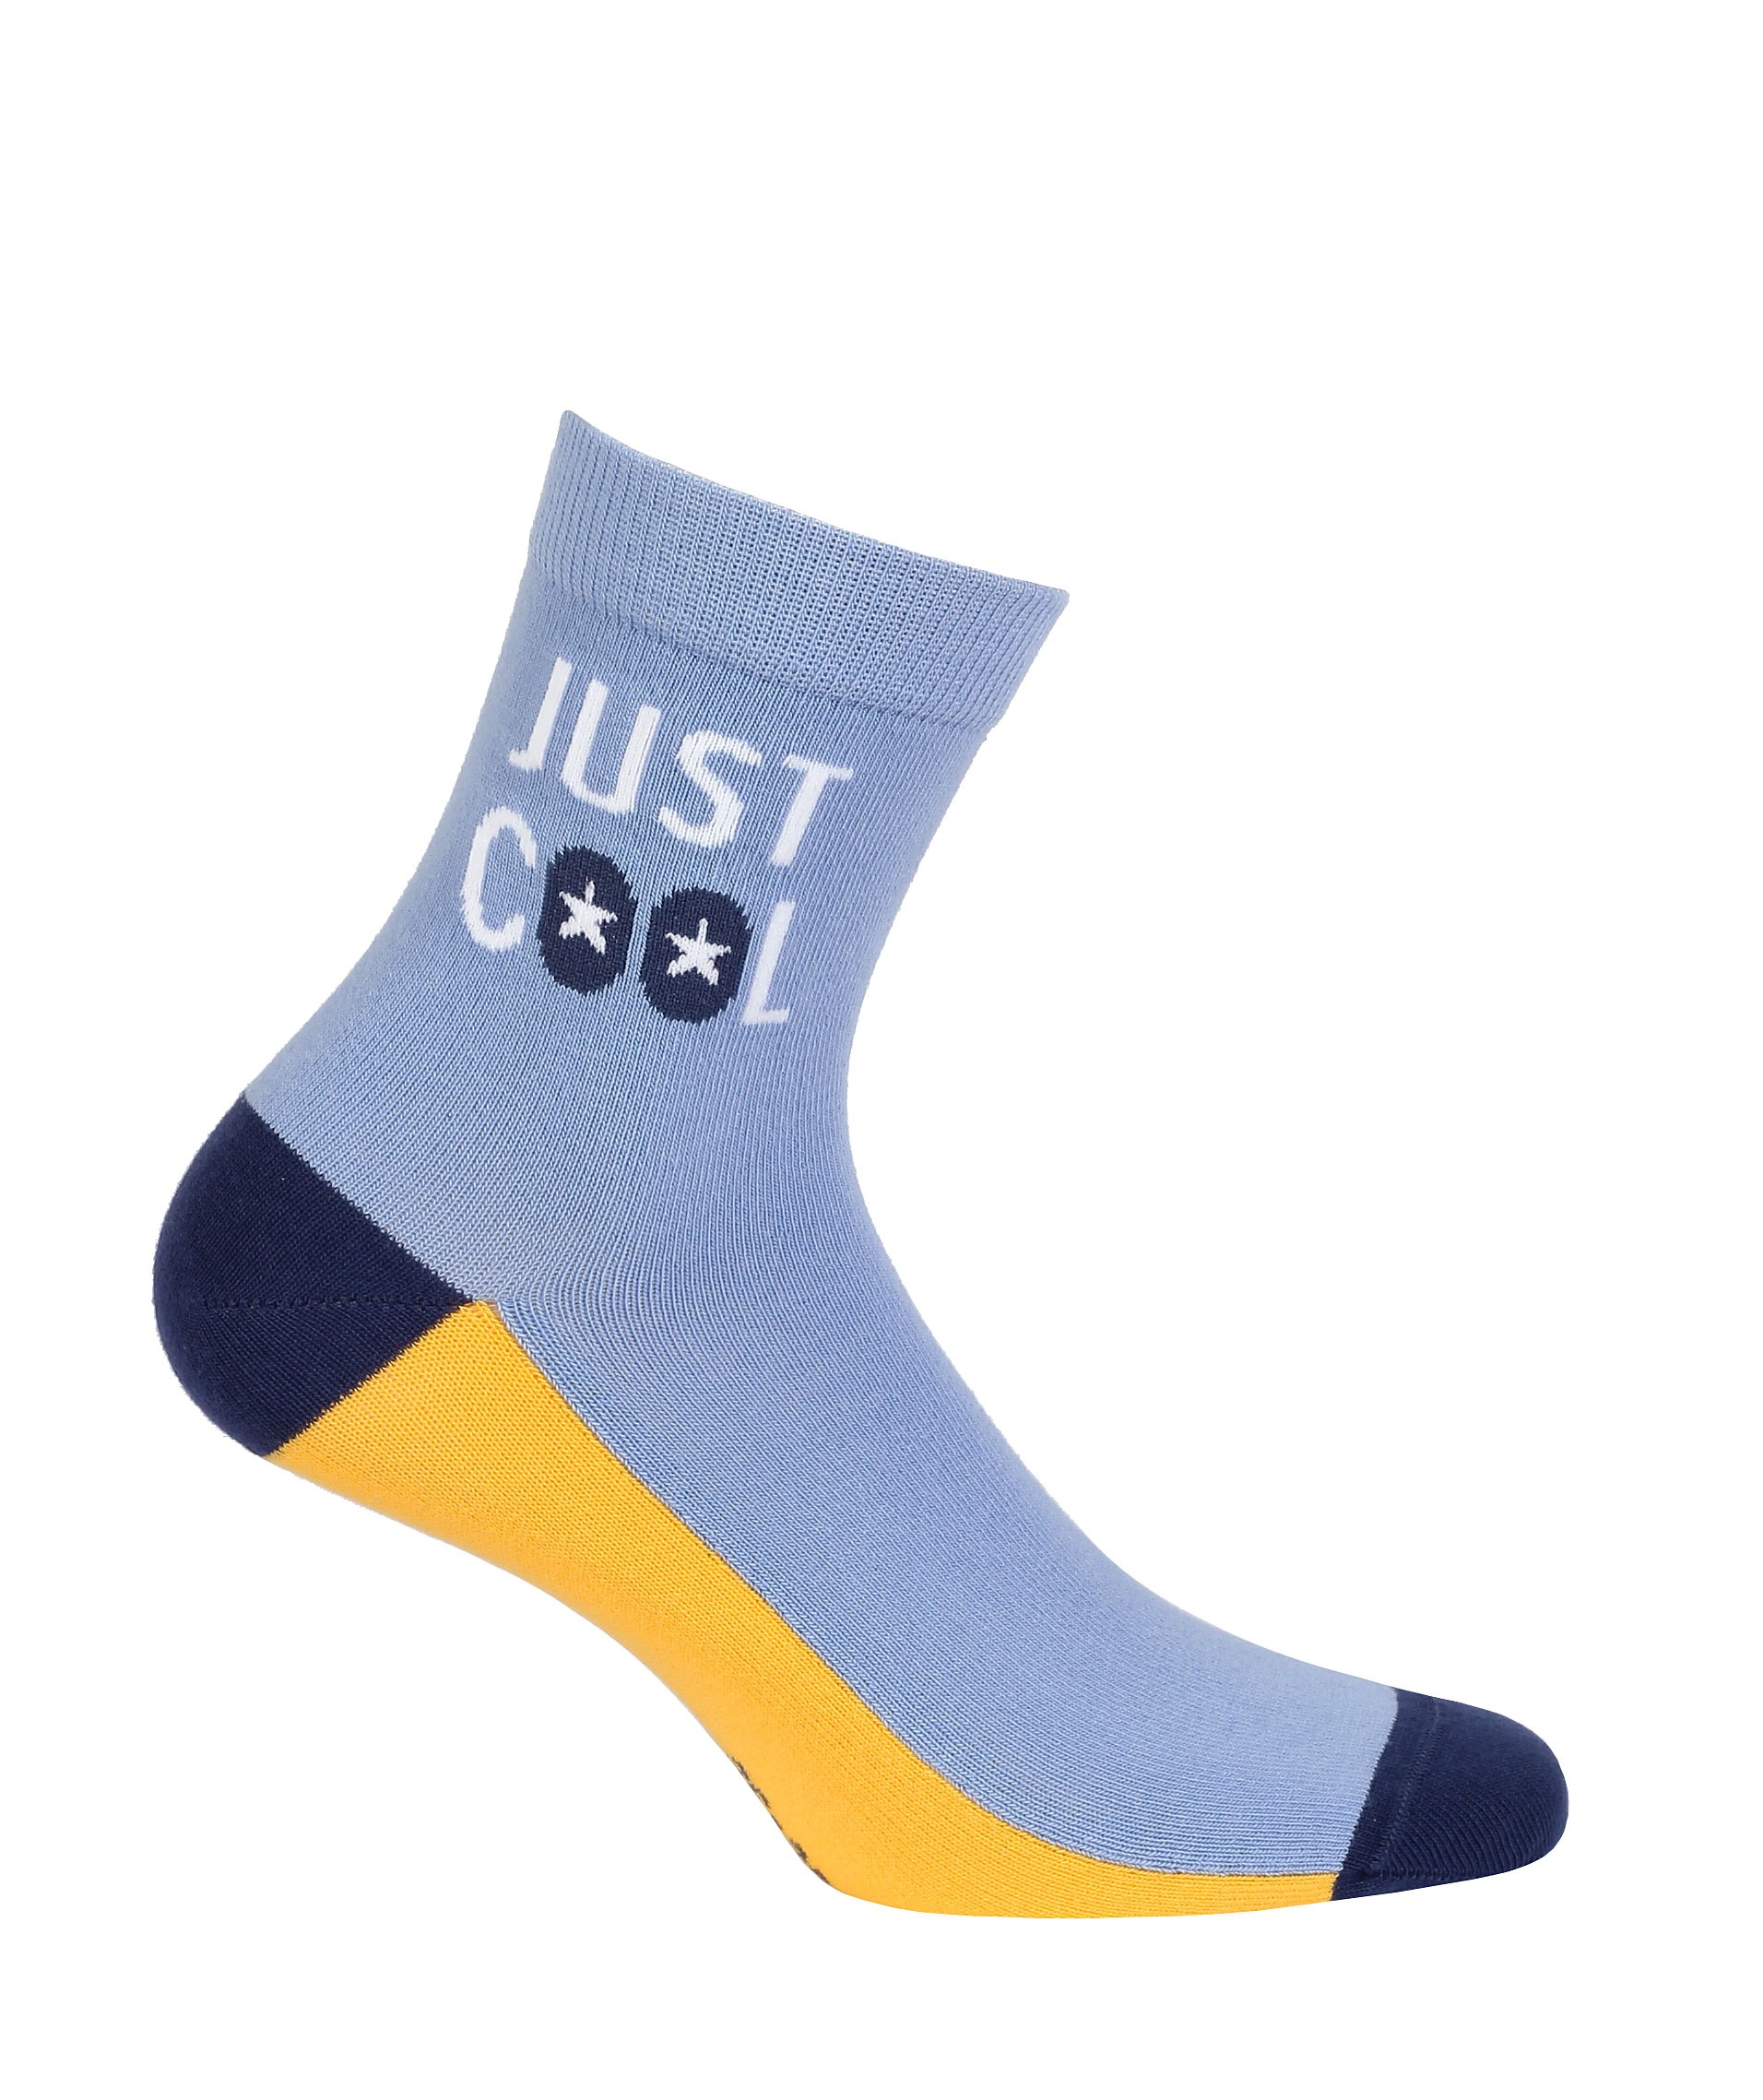 dětské ponožky vzor GATTA JUST COOL 36-38